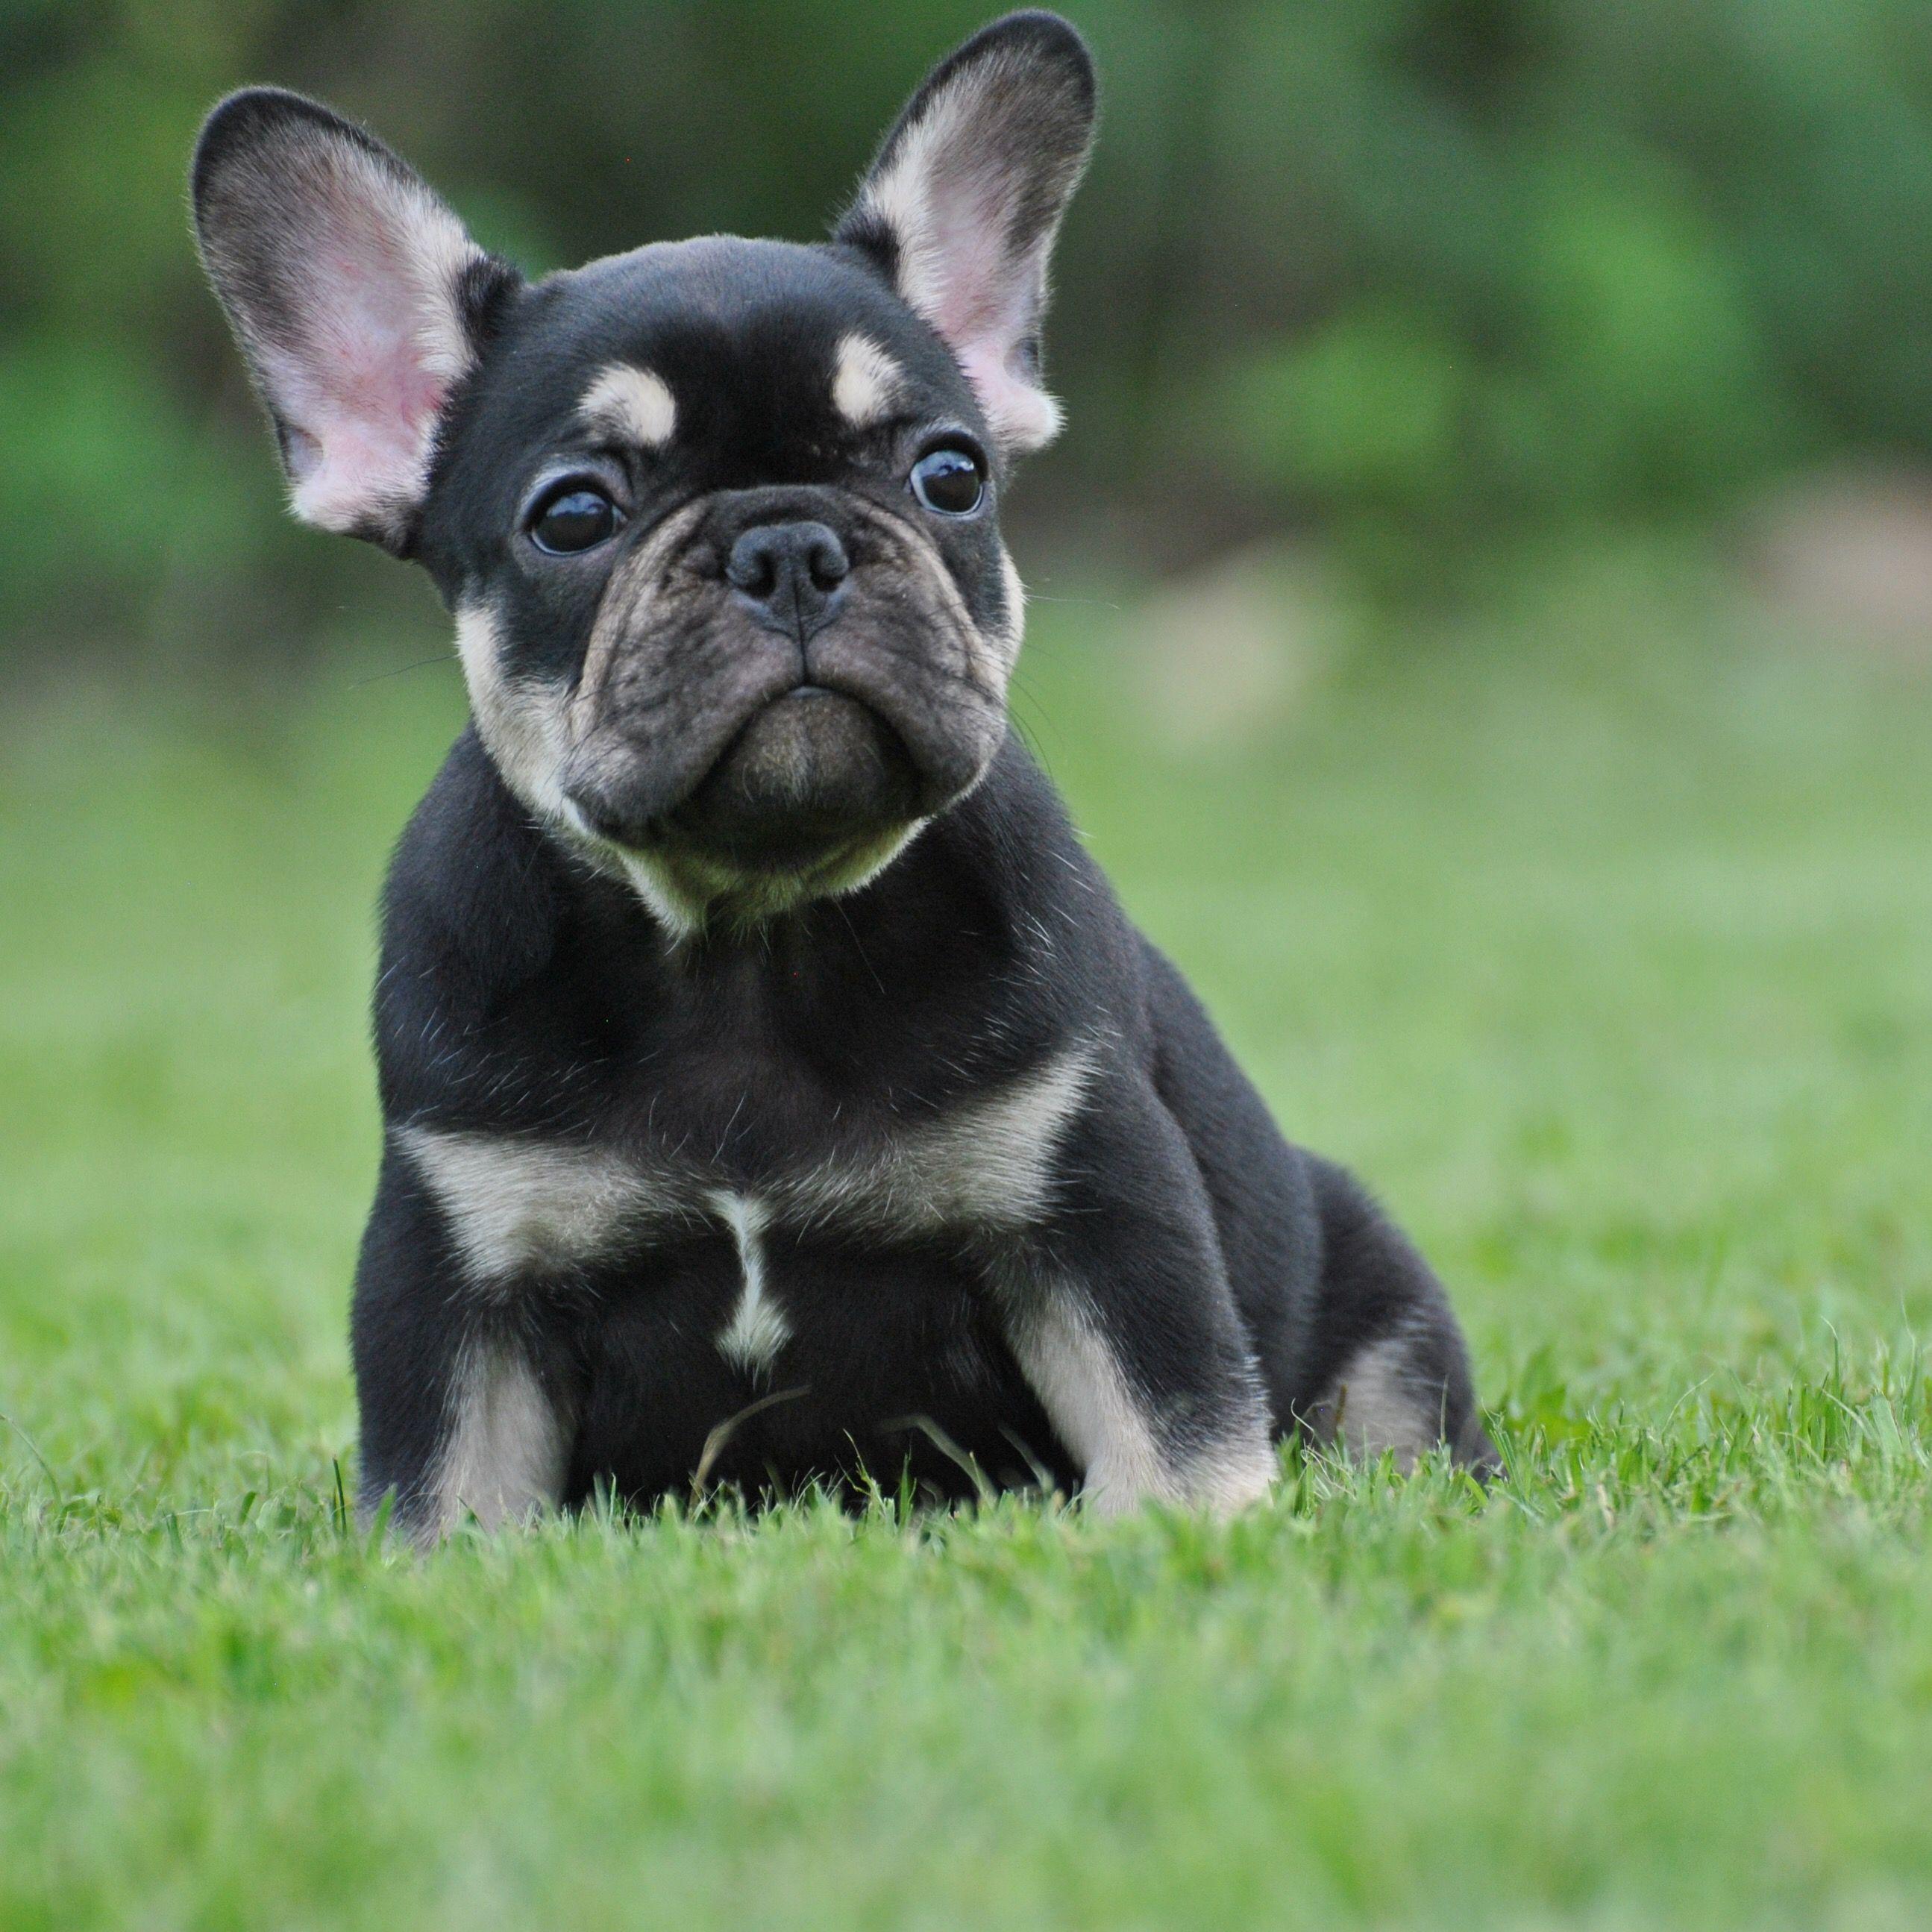 Jaha The Black And Tan Frenchie Bulldog Puppies Frenchie Puppy French Bulldog Puppies French bulldog pet friend dog green